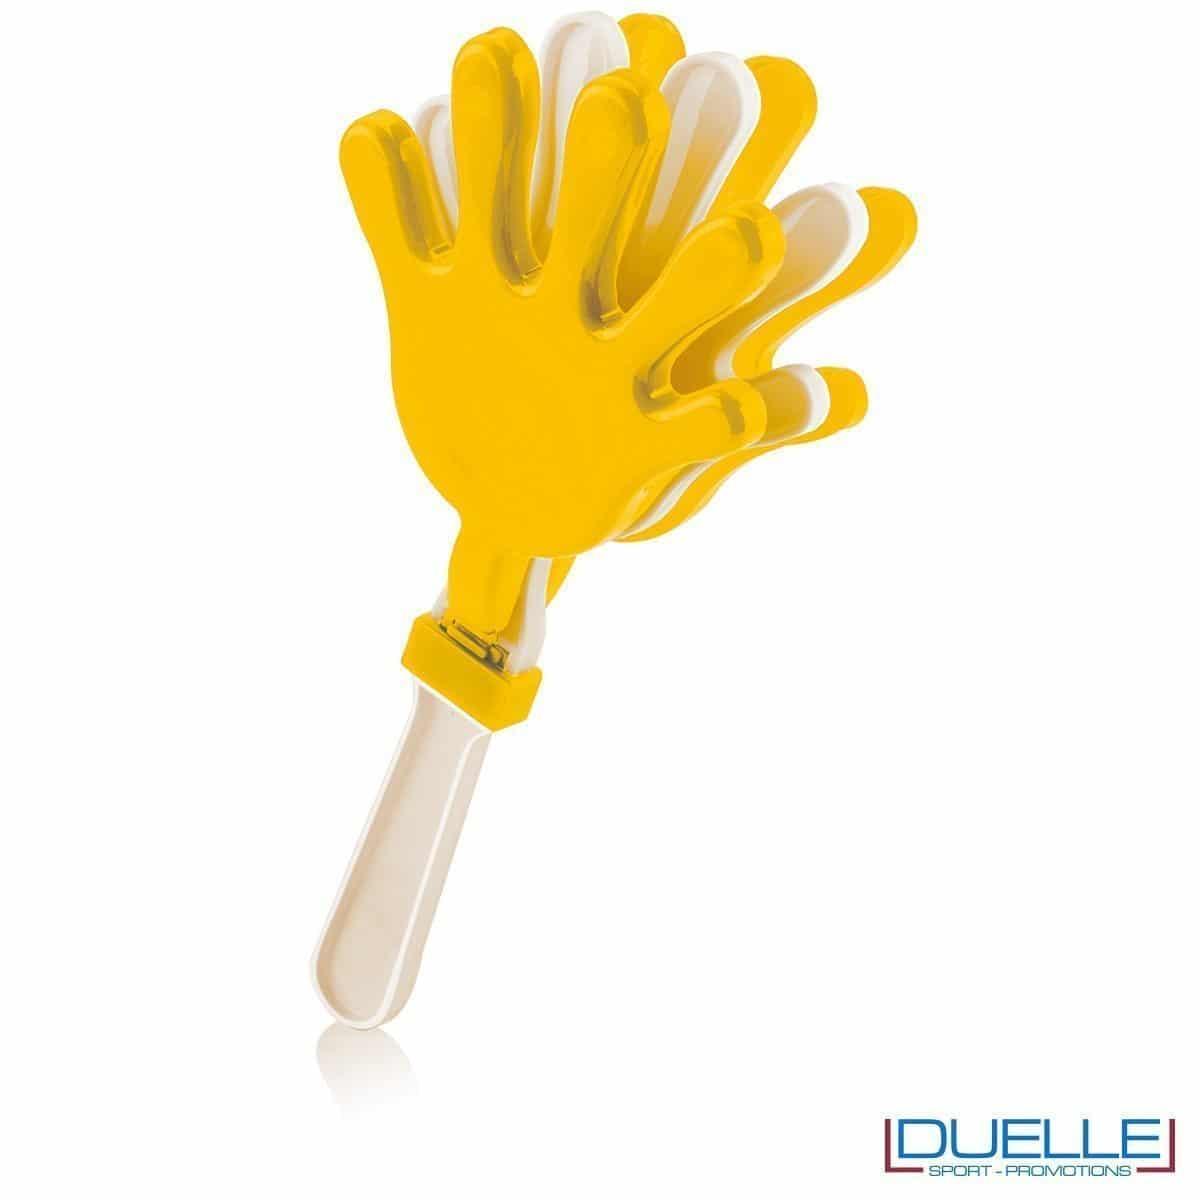 gadget tifoserie - manina per feste colore giallo -gadget estate, gadget feste